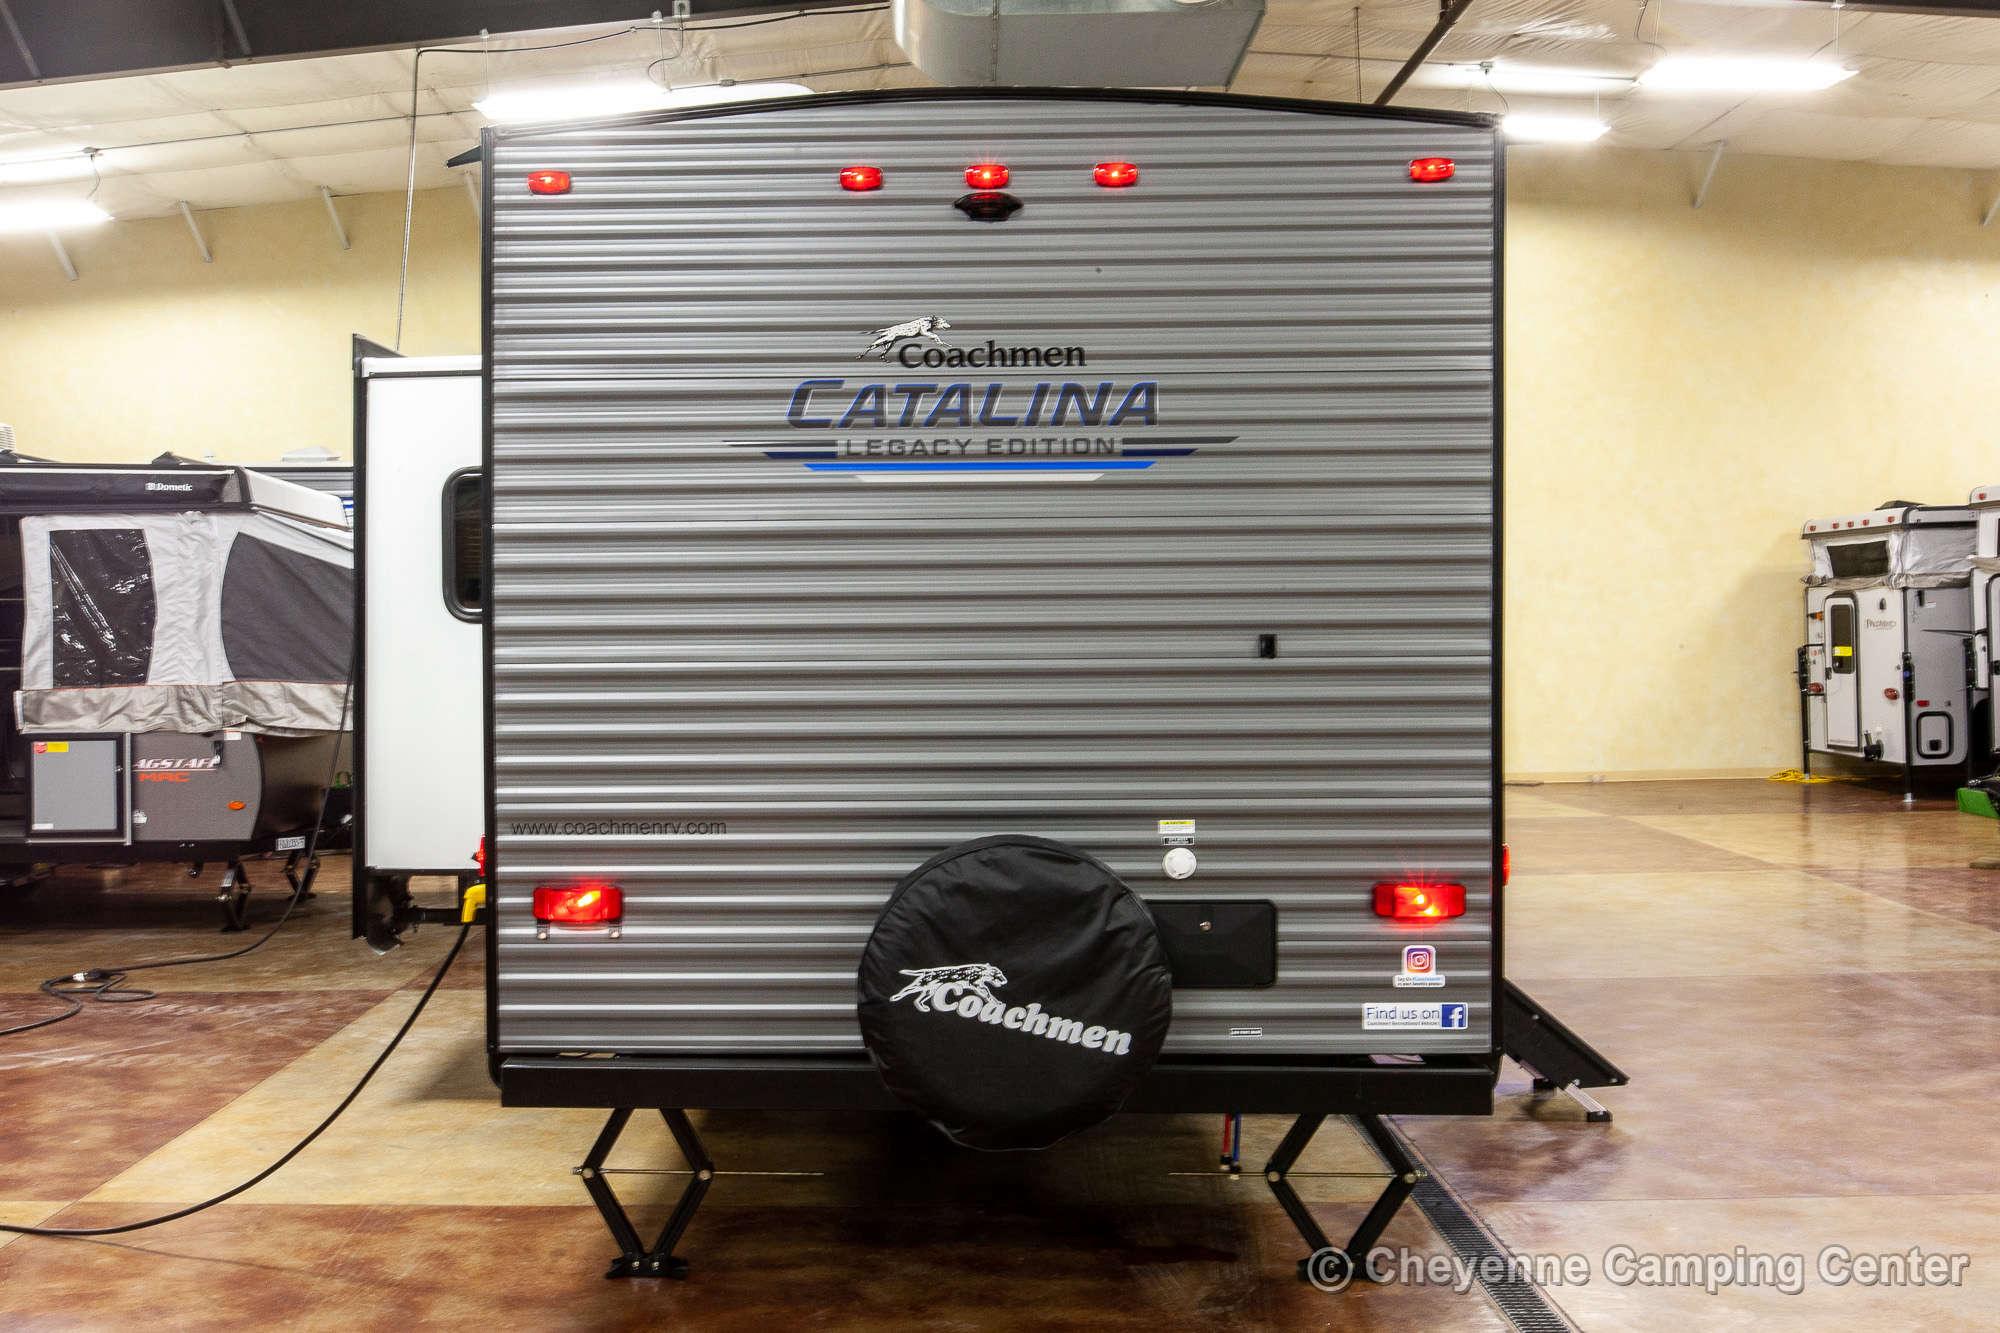 2021 Coachmen Catalina Legacy Edition 263BHSCK Bunkhouse Travel Trailer Exterior Image